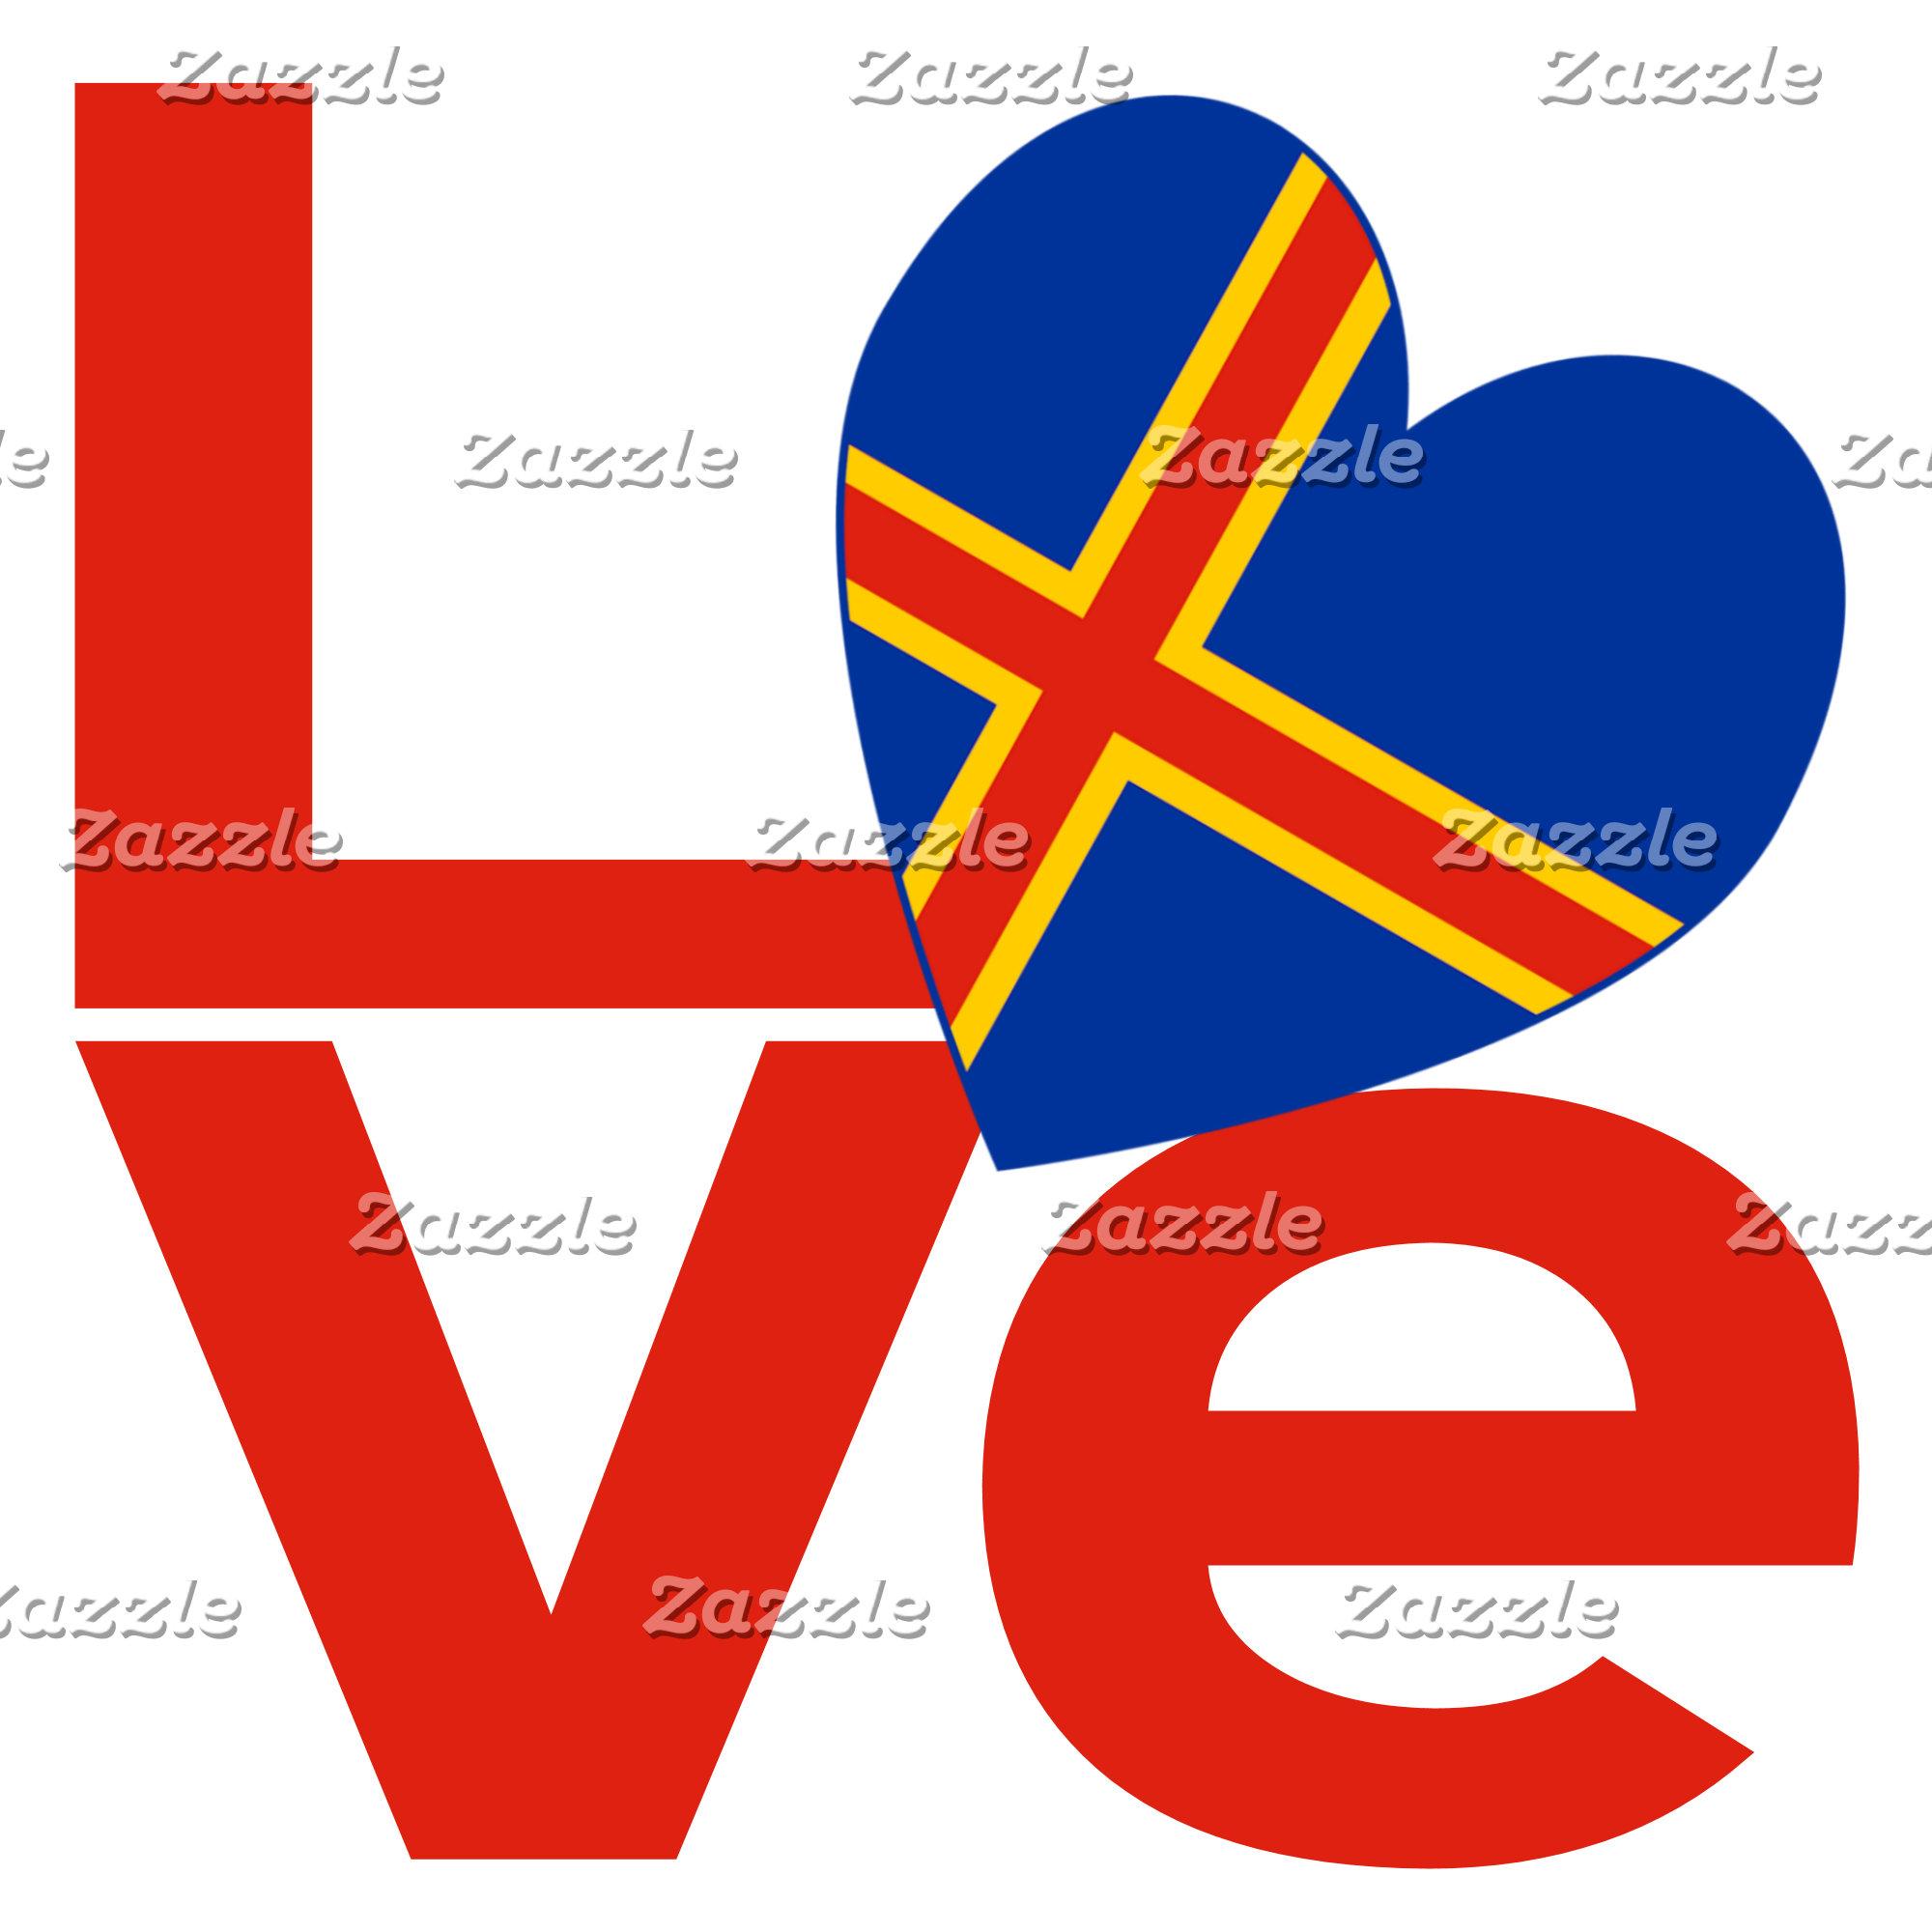 Aaland Islands Red LOVE Flag